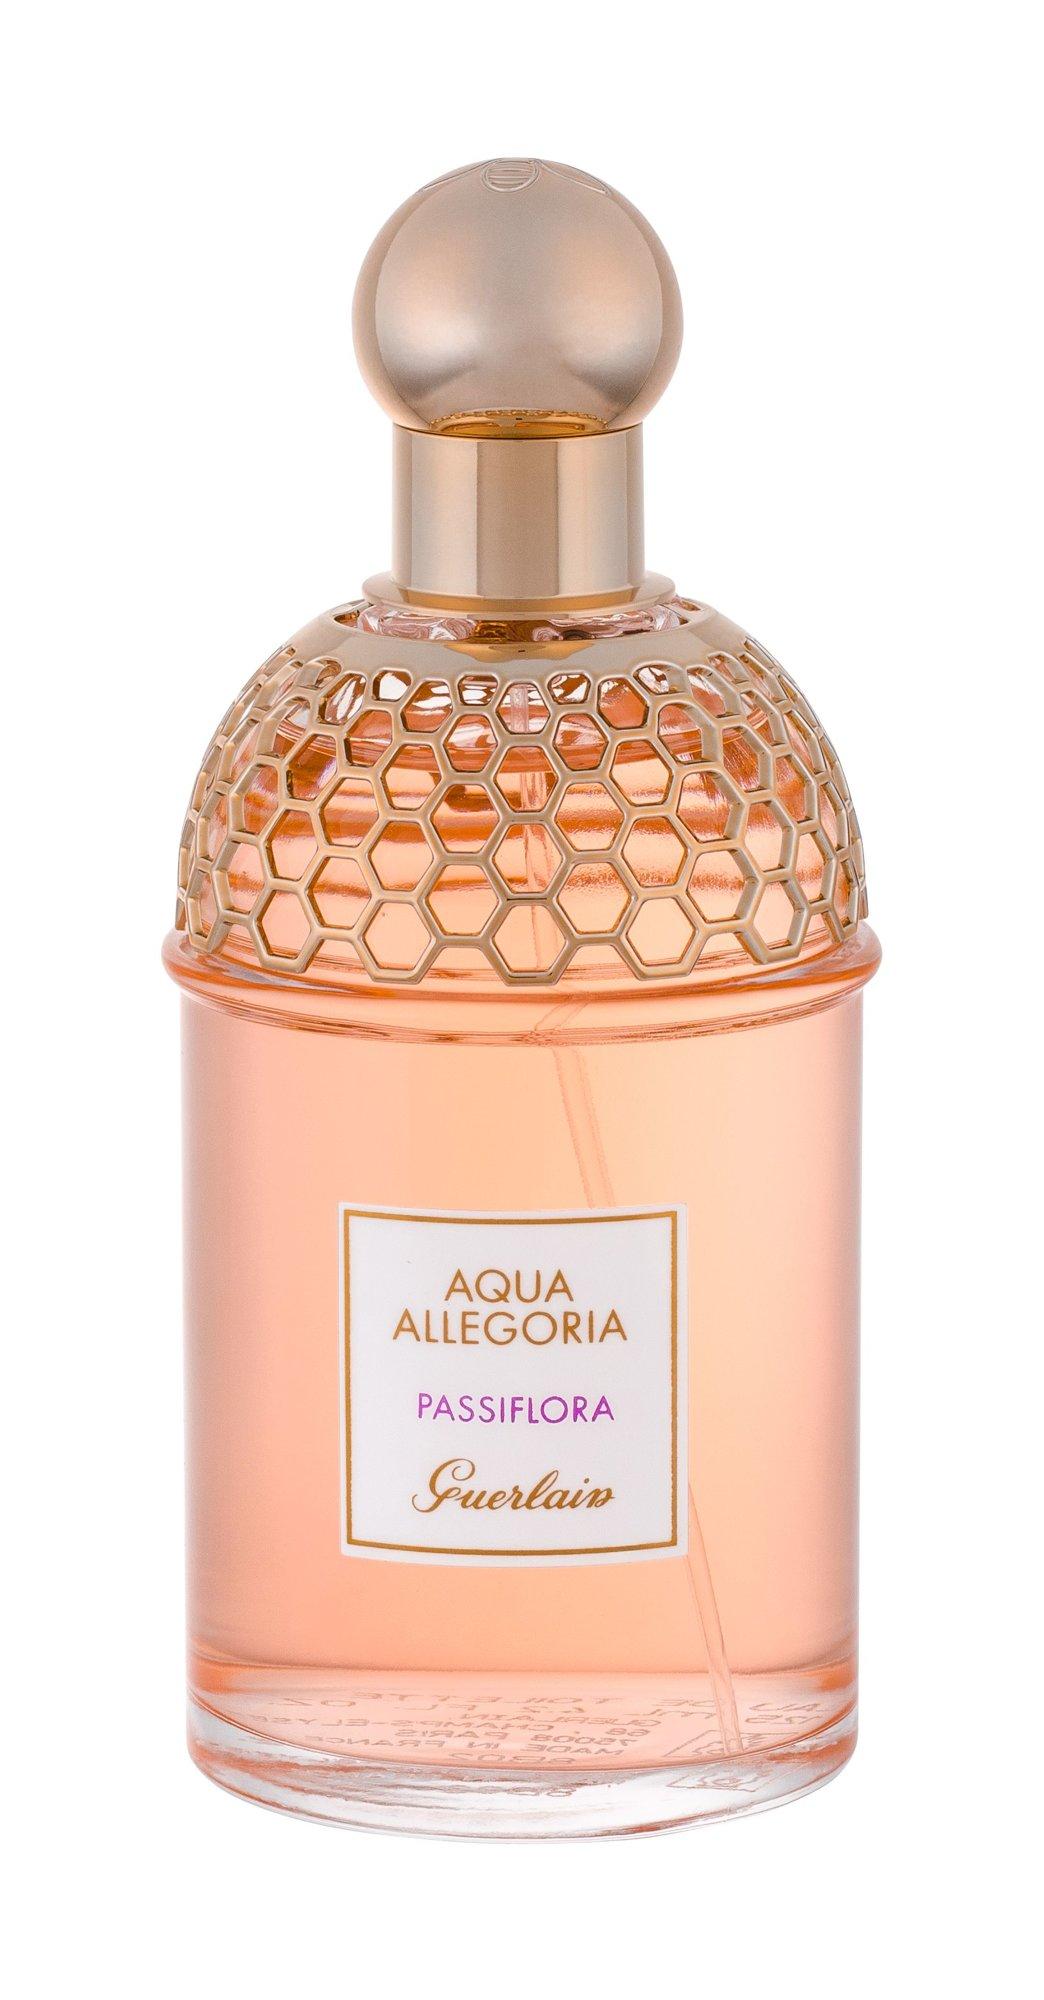 Guerlain Aqua Allegoria Passiflora, Toaletní voda 125ml